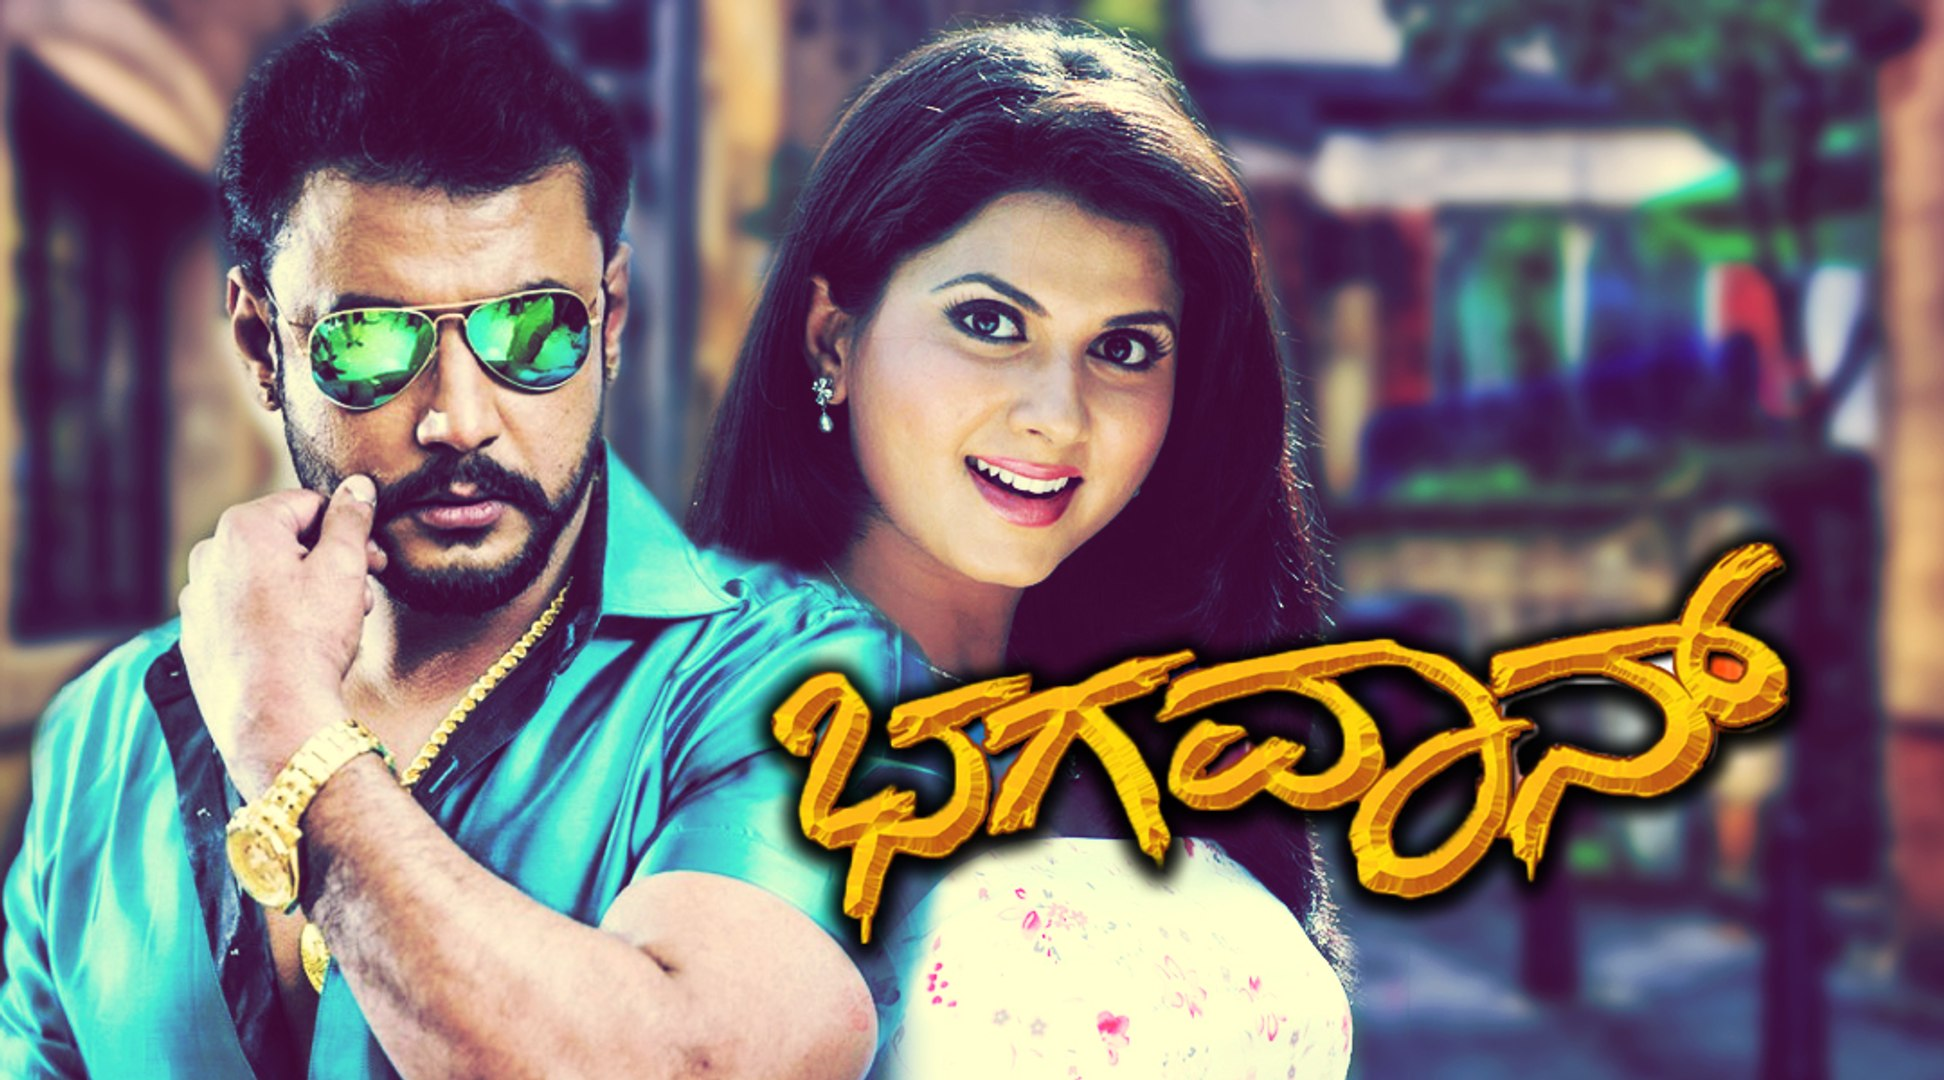 Bhagawan ಭಗವ ನ Full Kannada Movie Darshan Daisy Bopanna Kannada Action Film Video Dailymotion